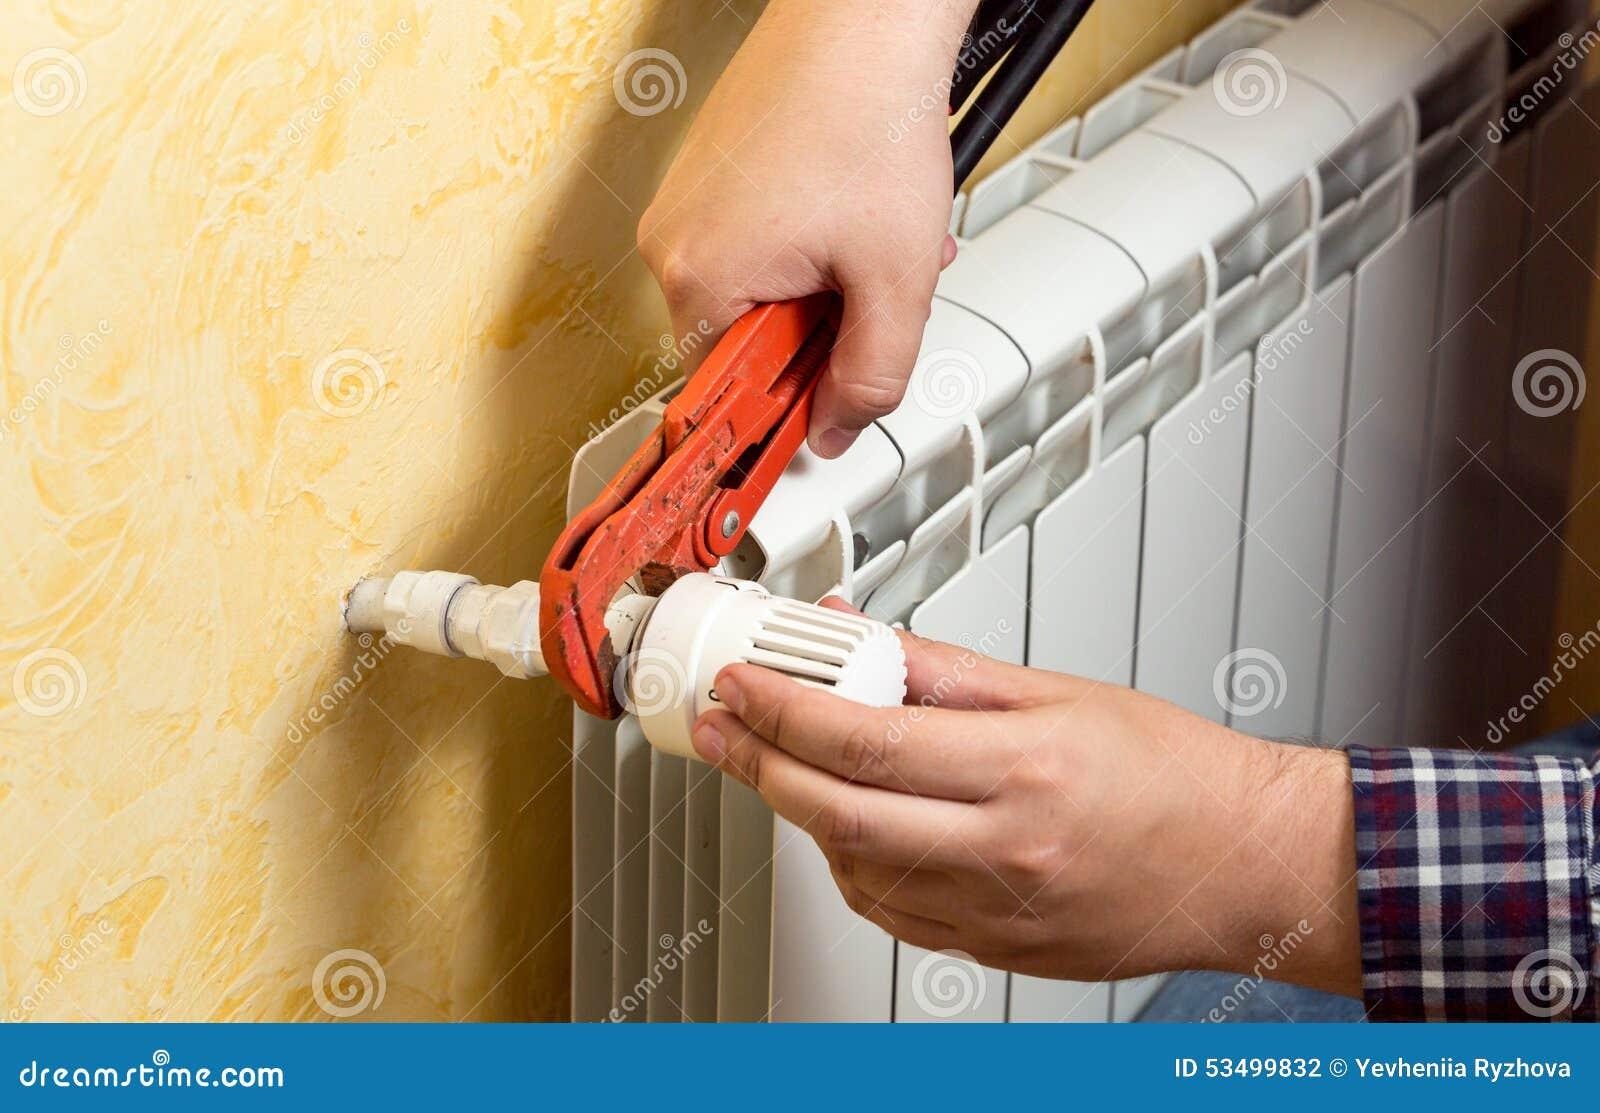 Closeup of man installing heating radiator and connecting valve